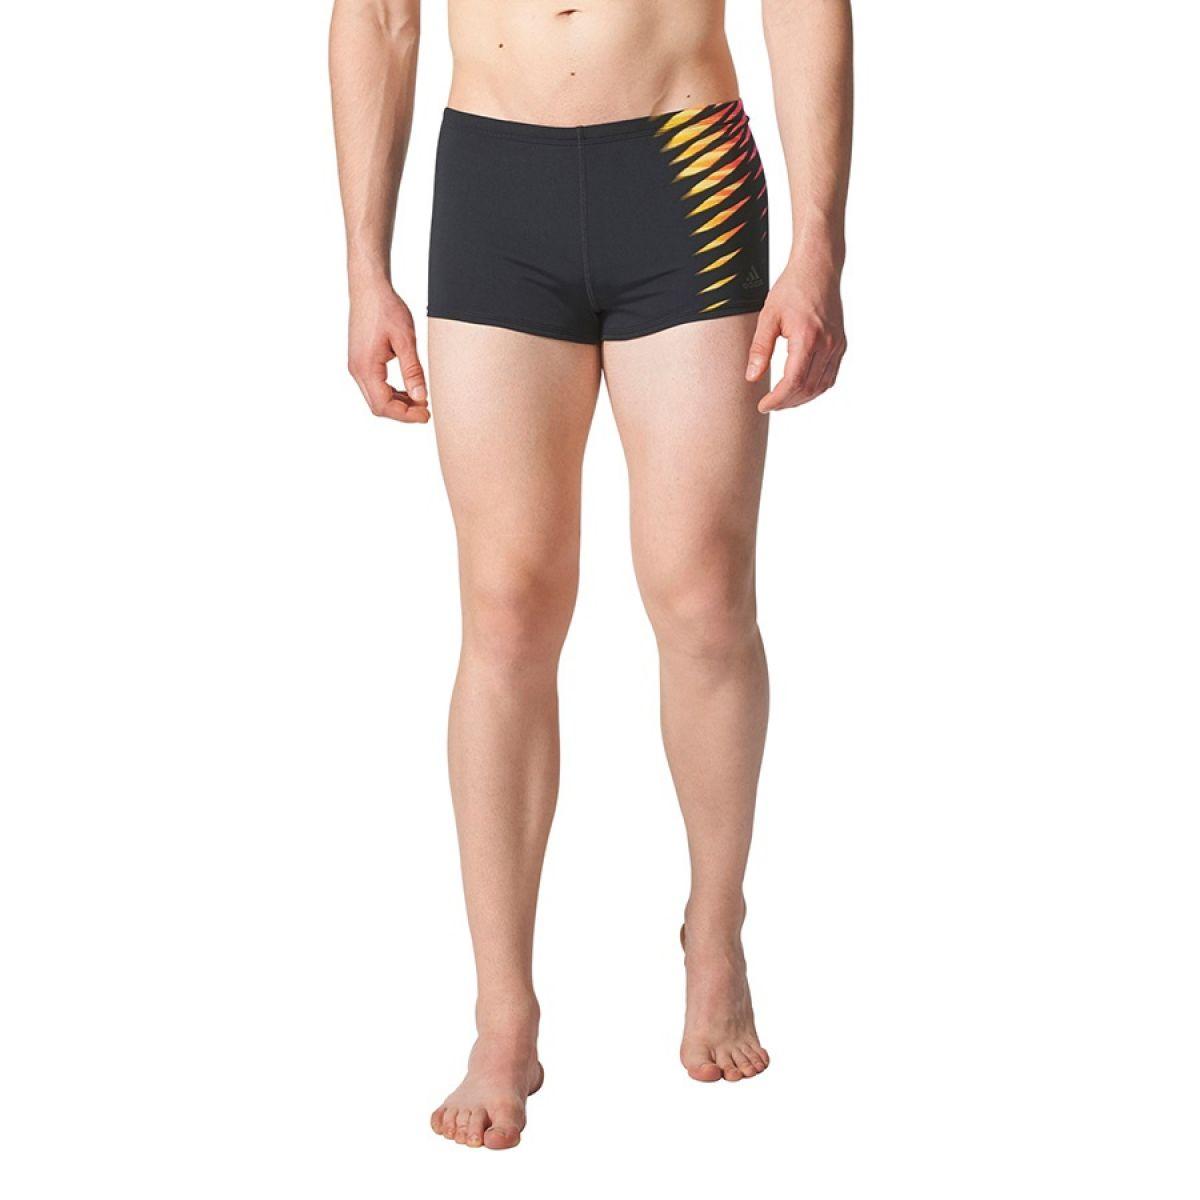 072d29af2f0062 Kąpielówki adidas Grapic Swim Boxers BP5831 48 - 7081213411 ...